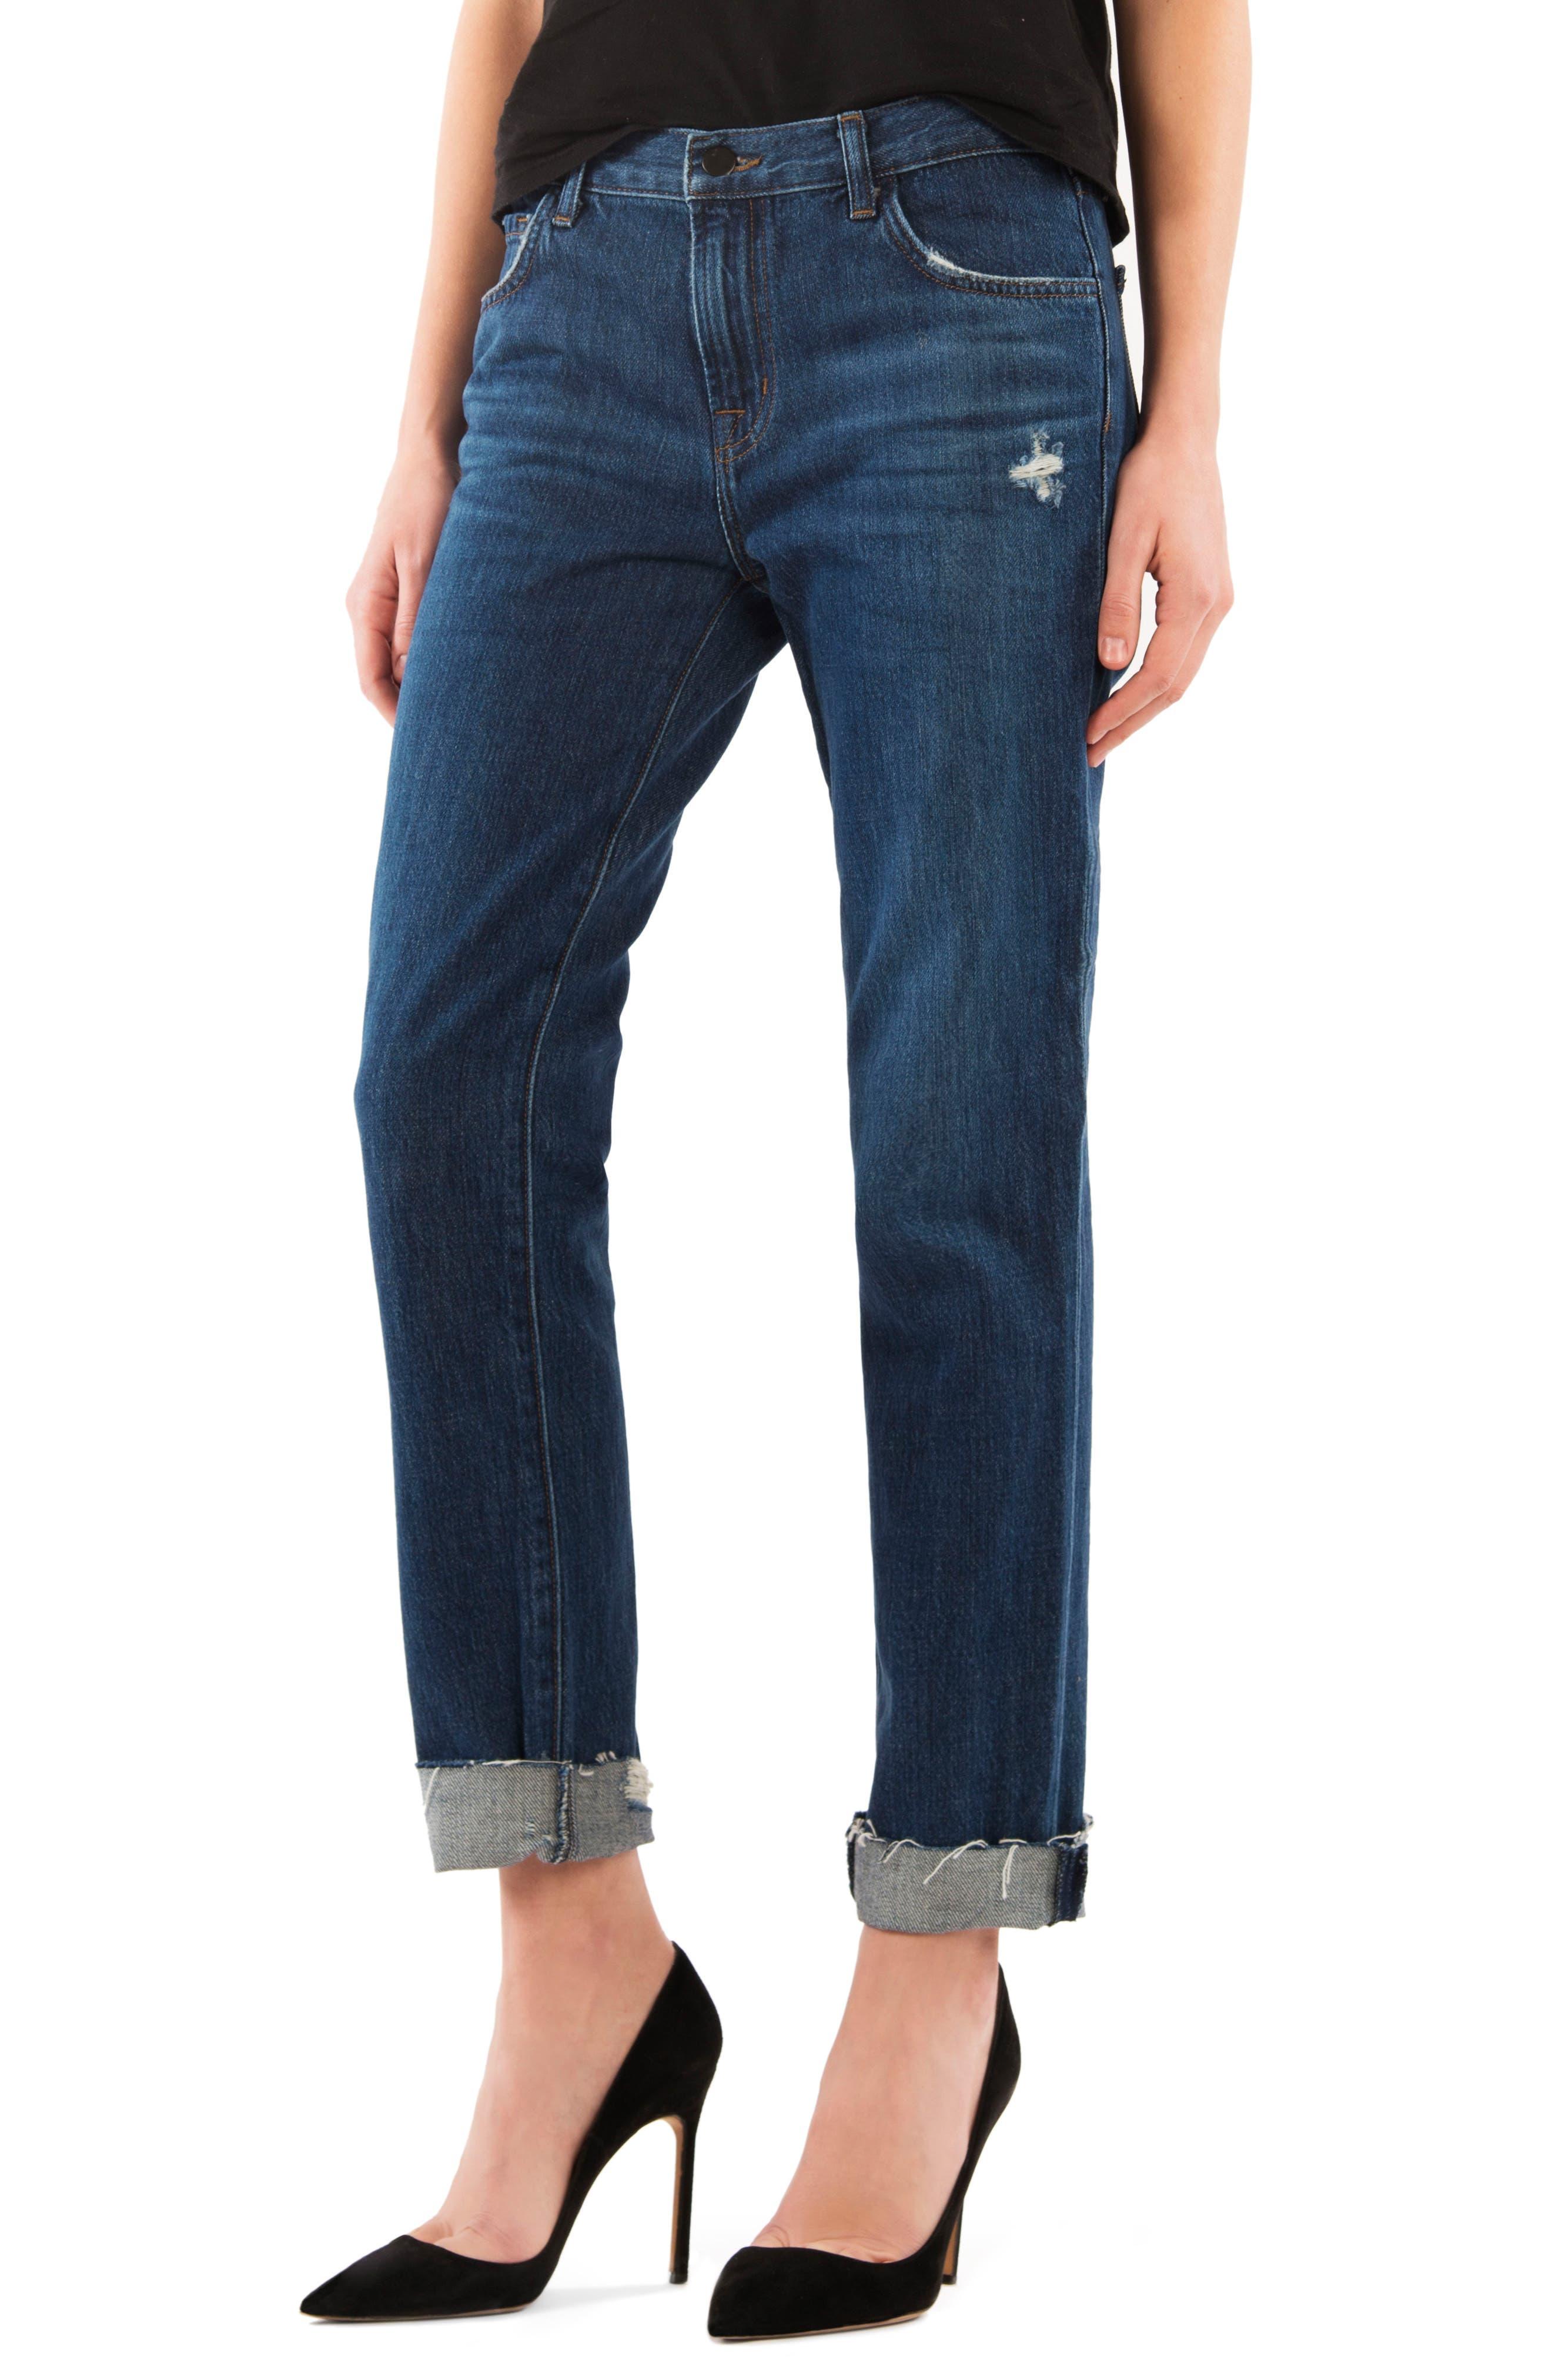 Johnny Mid Rise Boyfriend Jeans,                         Main,                         color, Doubletake